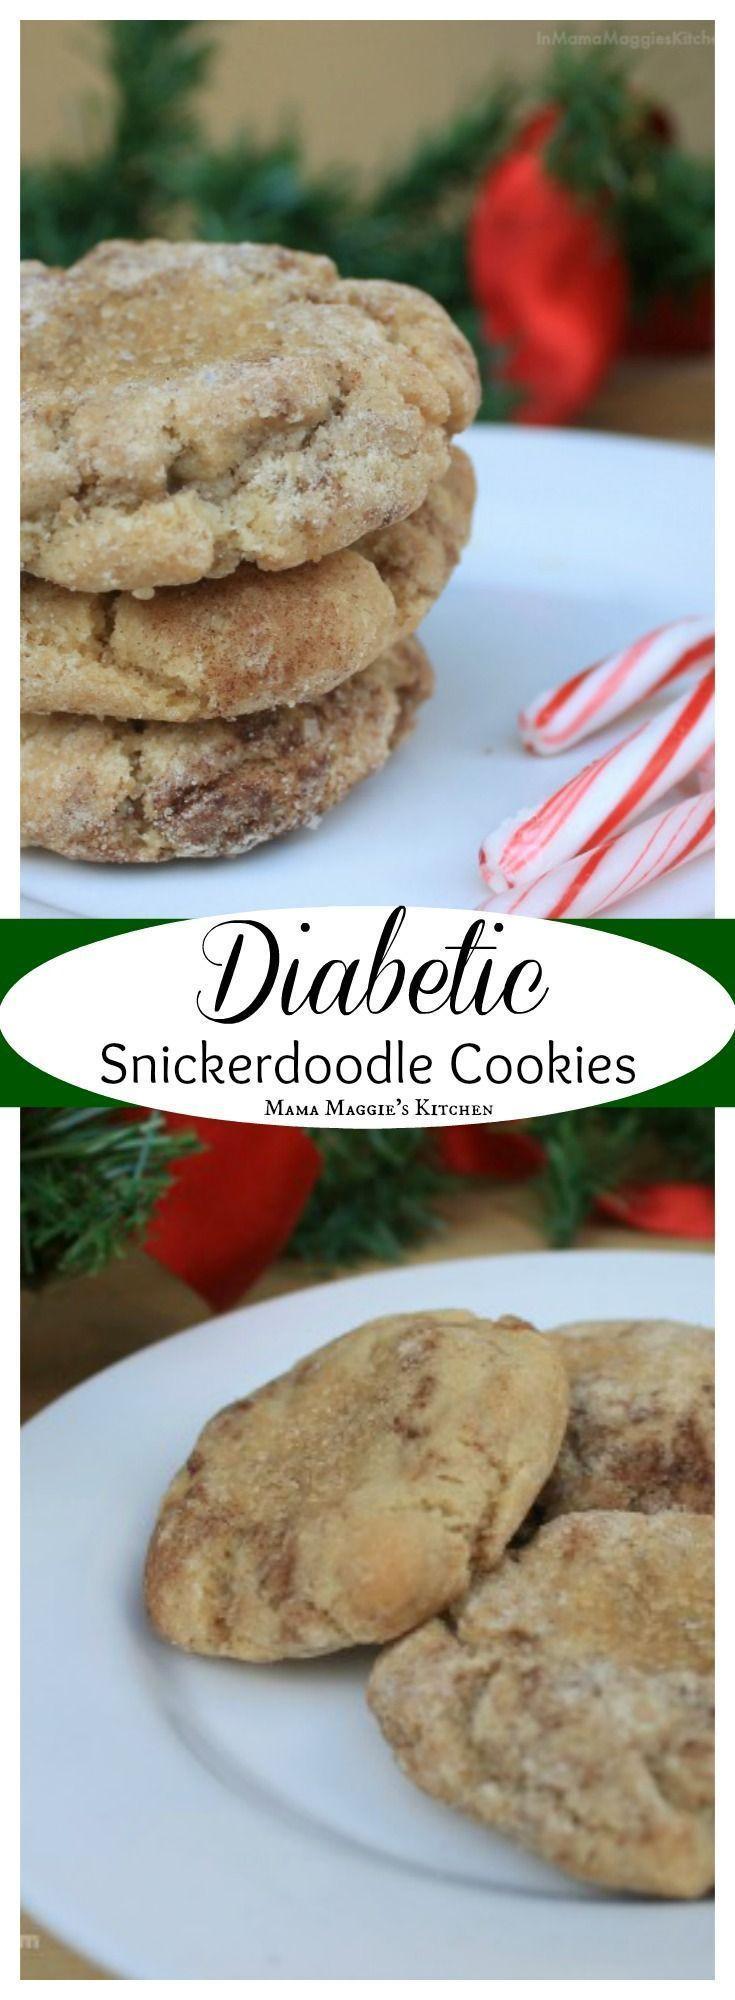 Low Sugar Desserts For Diabetics  The 25 best Diabetic desserts ideas on Pinterest